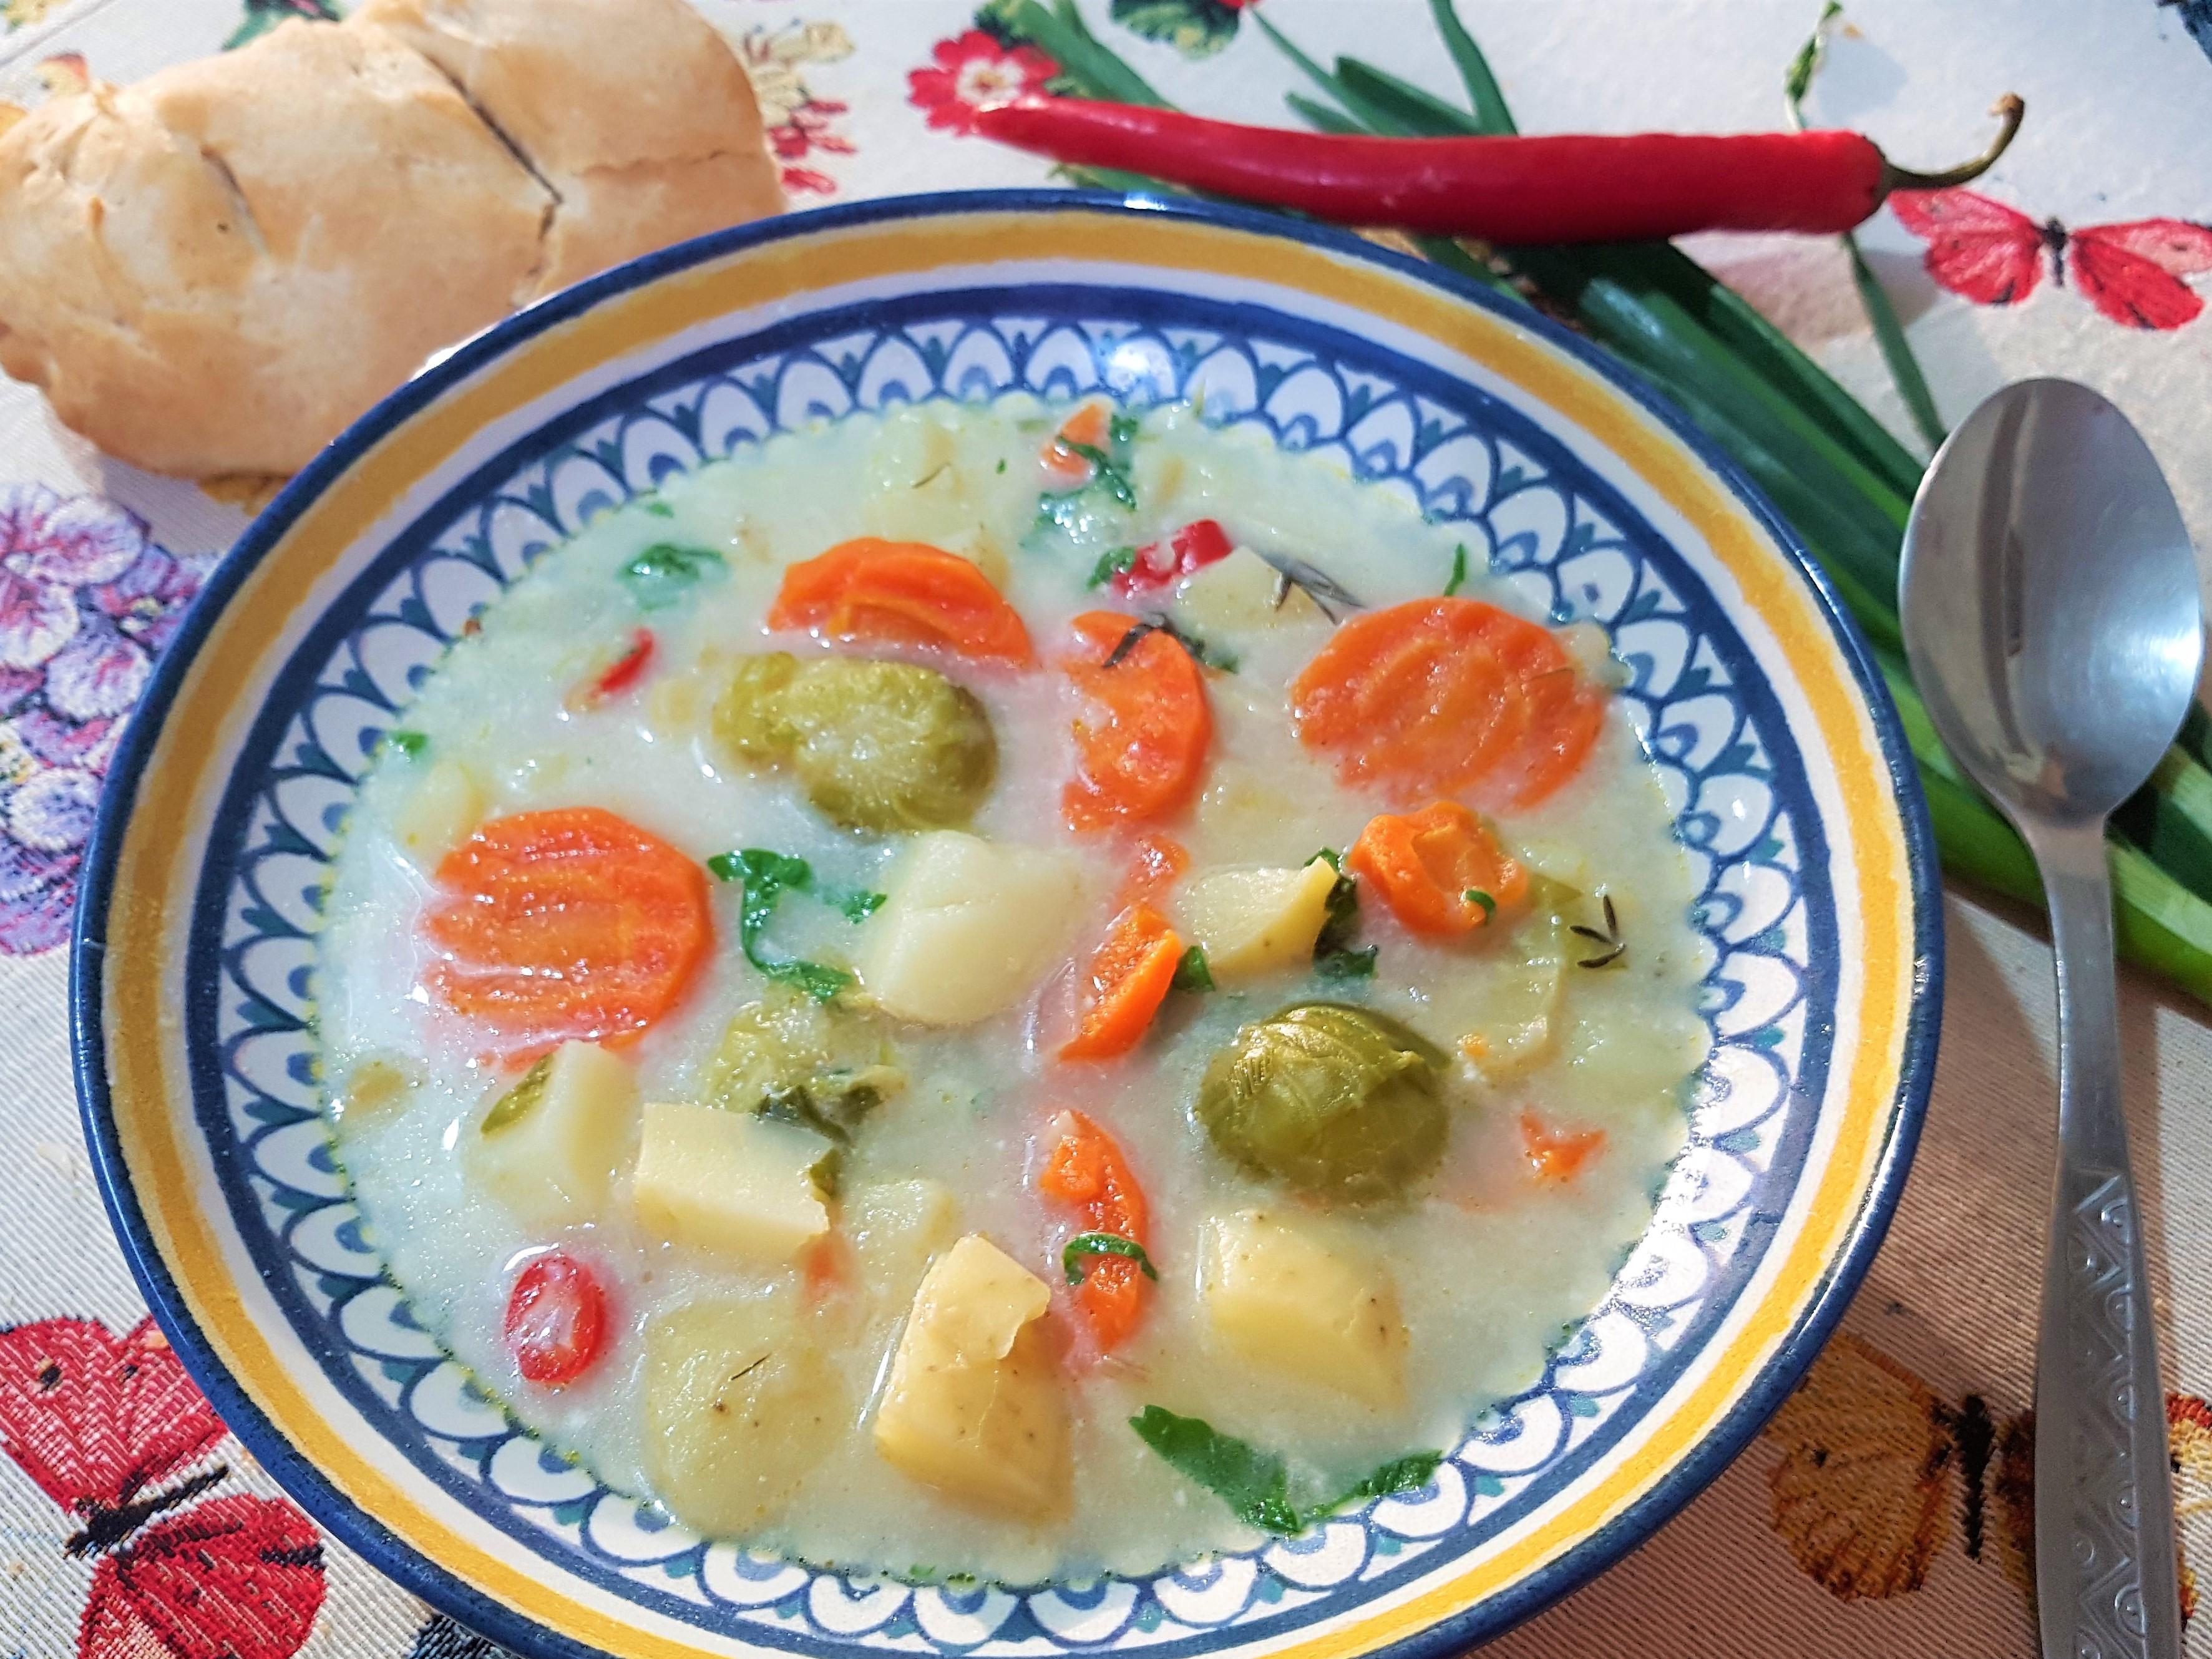 Supa de cartofi noi, verzisoare de Bruxelles si iaurt grecesc